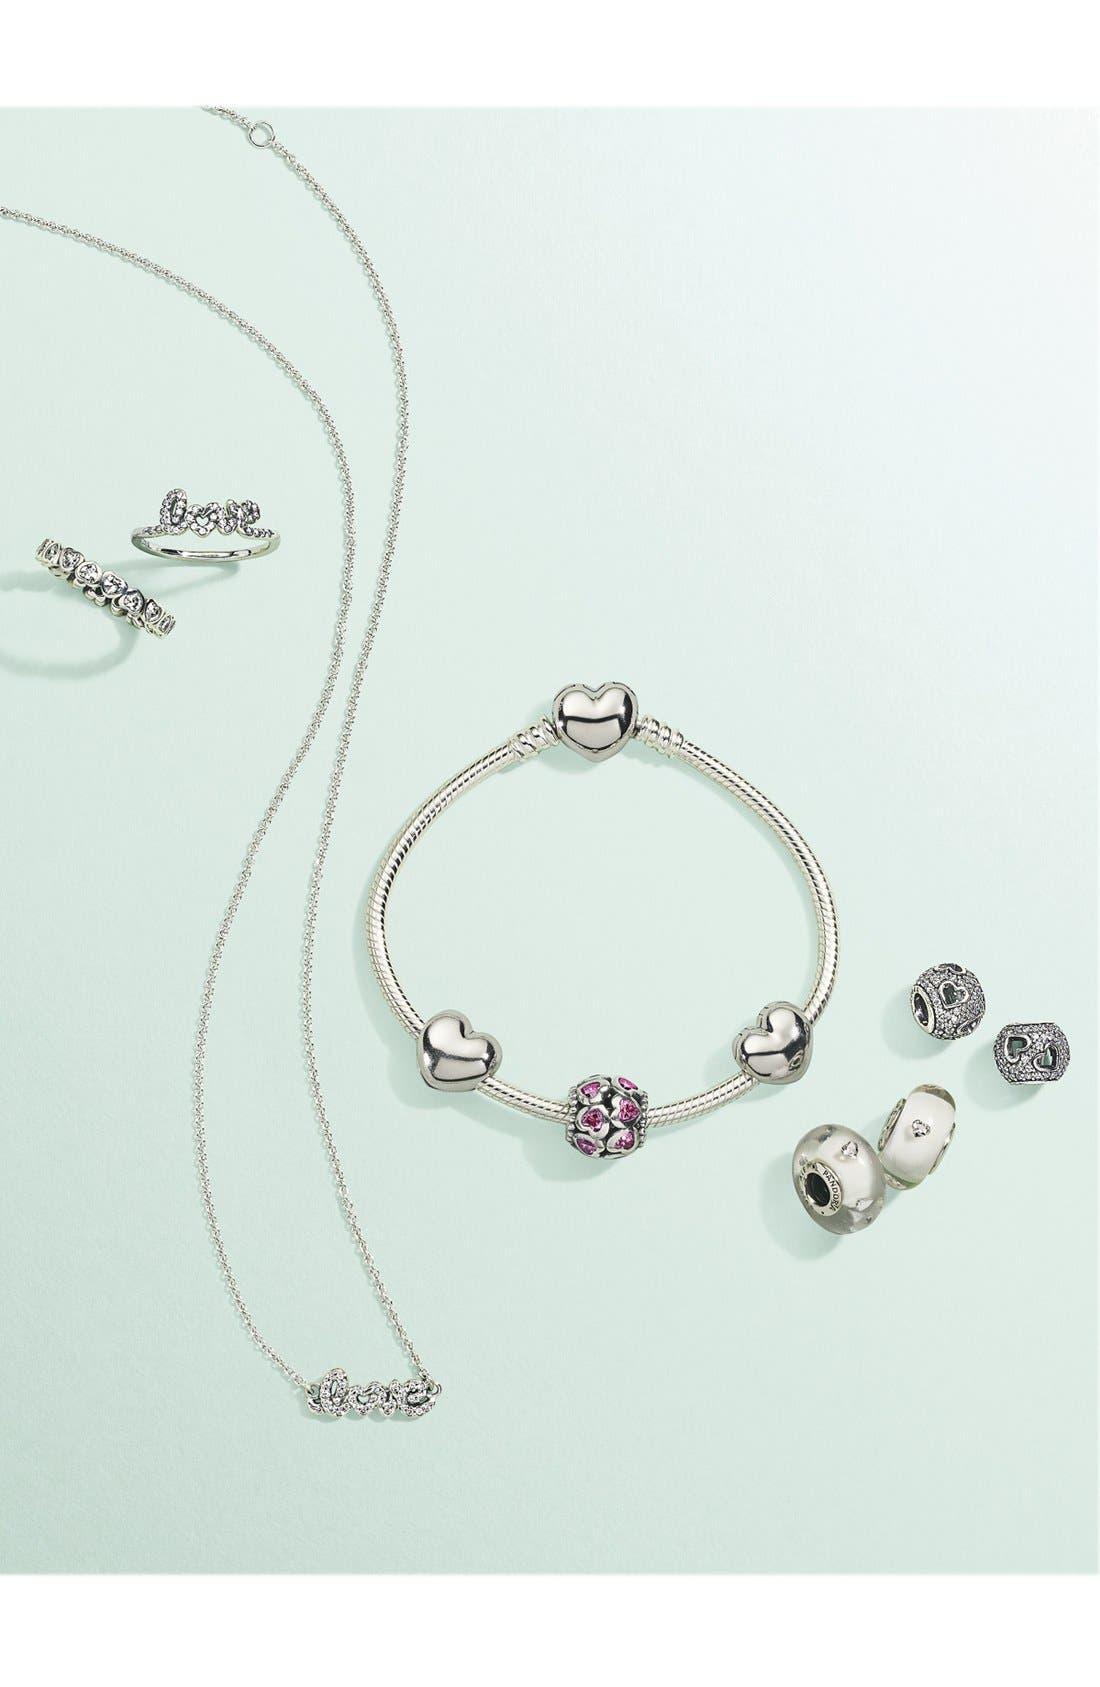 Alternate Image 3  - PANDORA 'From the Heart' Boxed Charm Bracelet Set